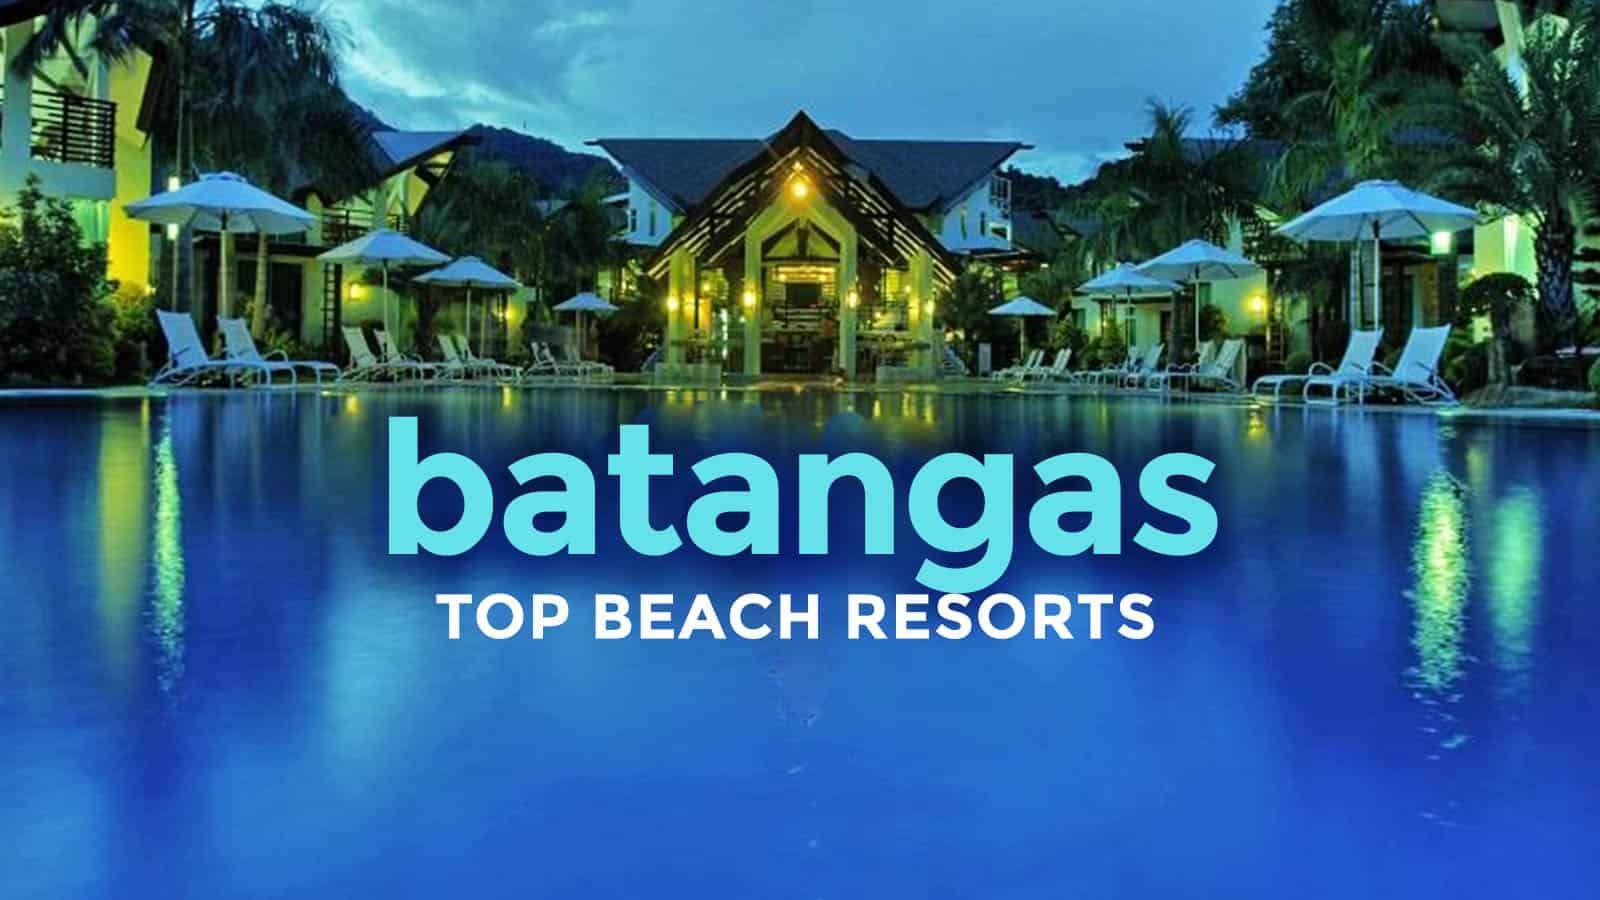 Top 10 Beach Resorts In Batangas The Poor Traveler Blog